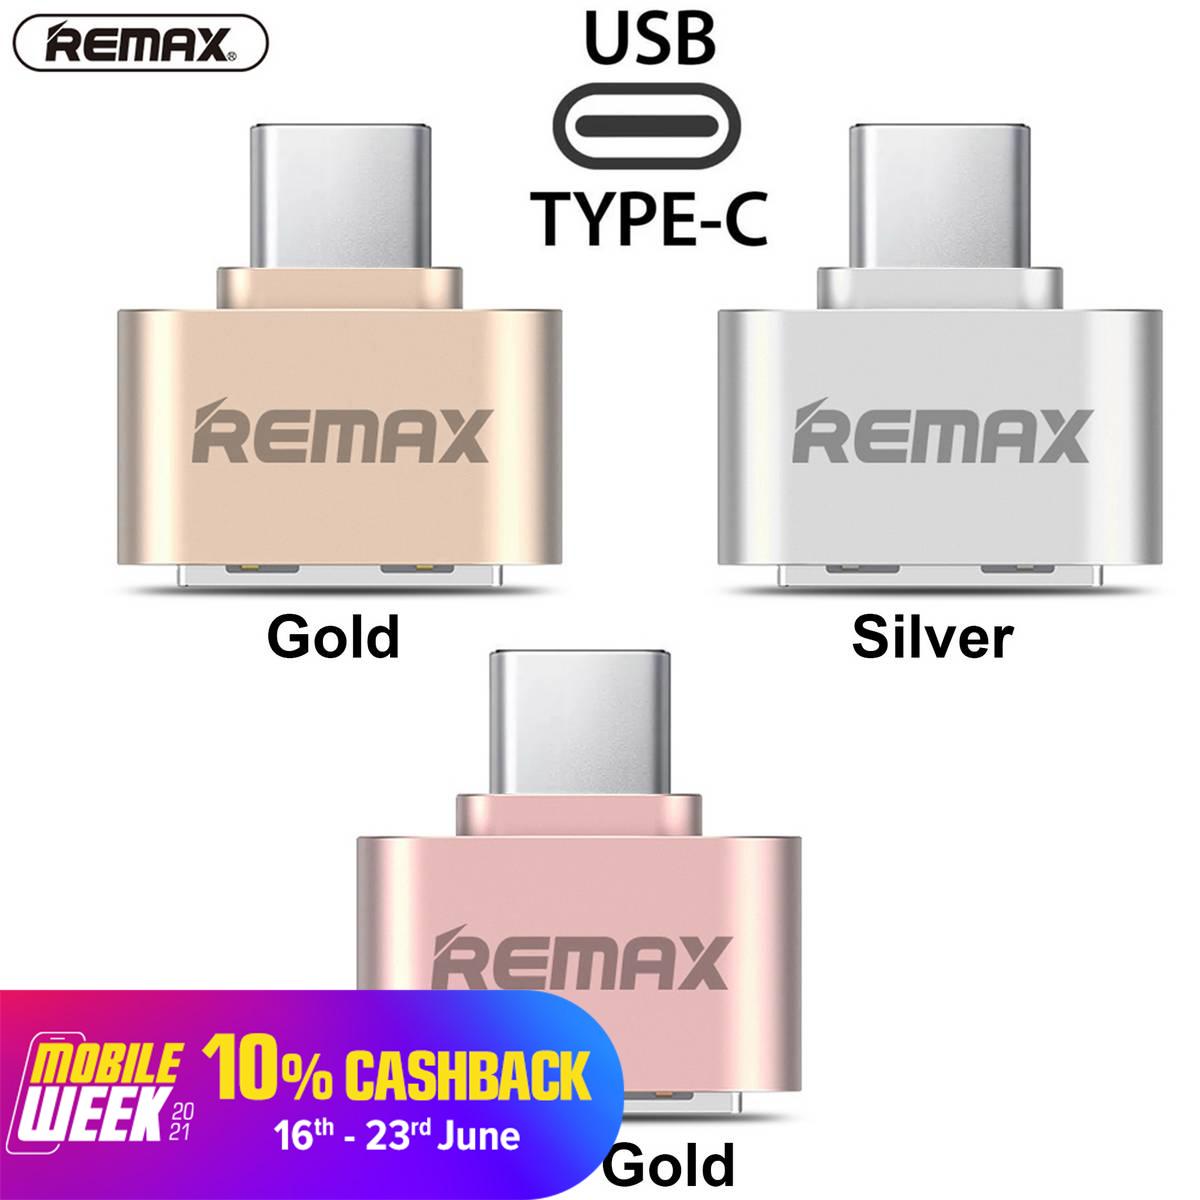 REMAX USB Type C OTG Adapter Female USB to Type C Male Data Adapter Travel Converter